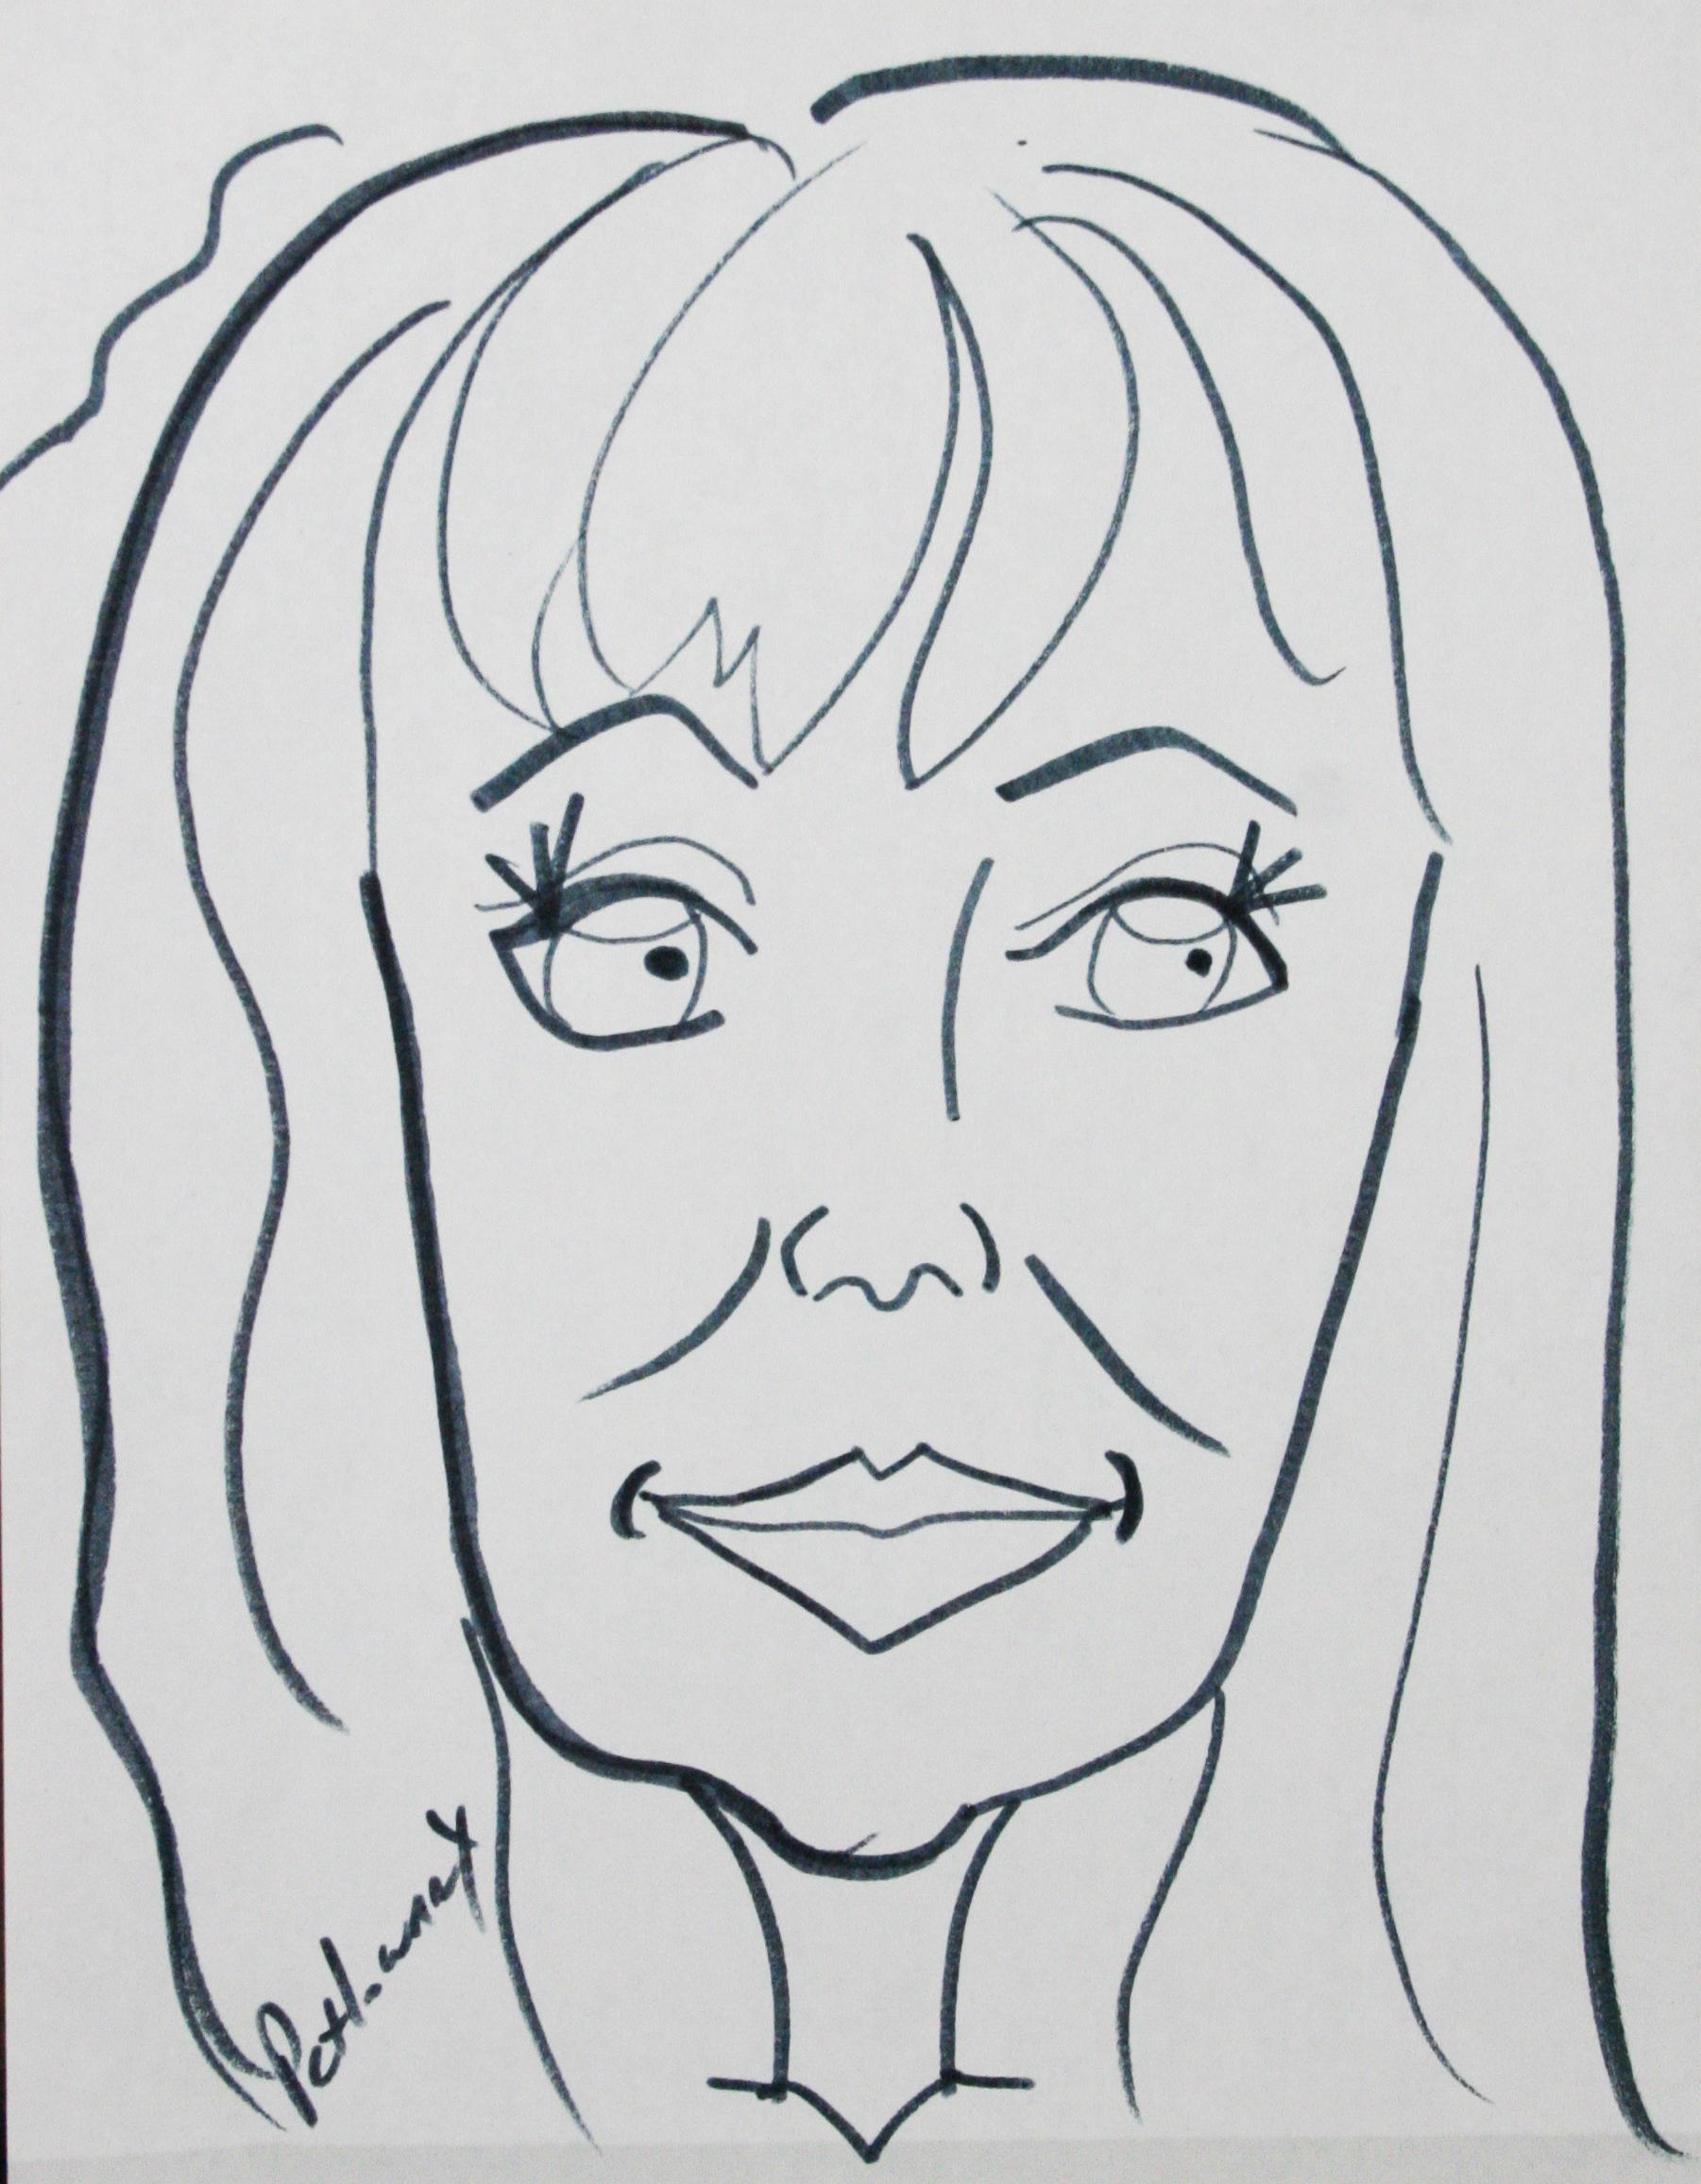 Paula Petlowany did this quick caricature.